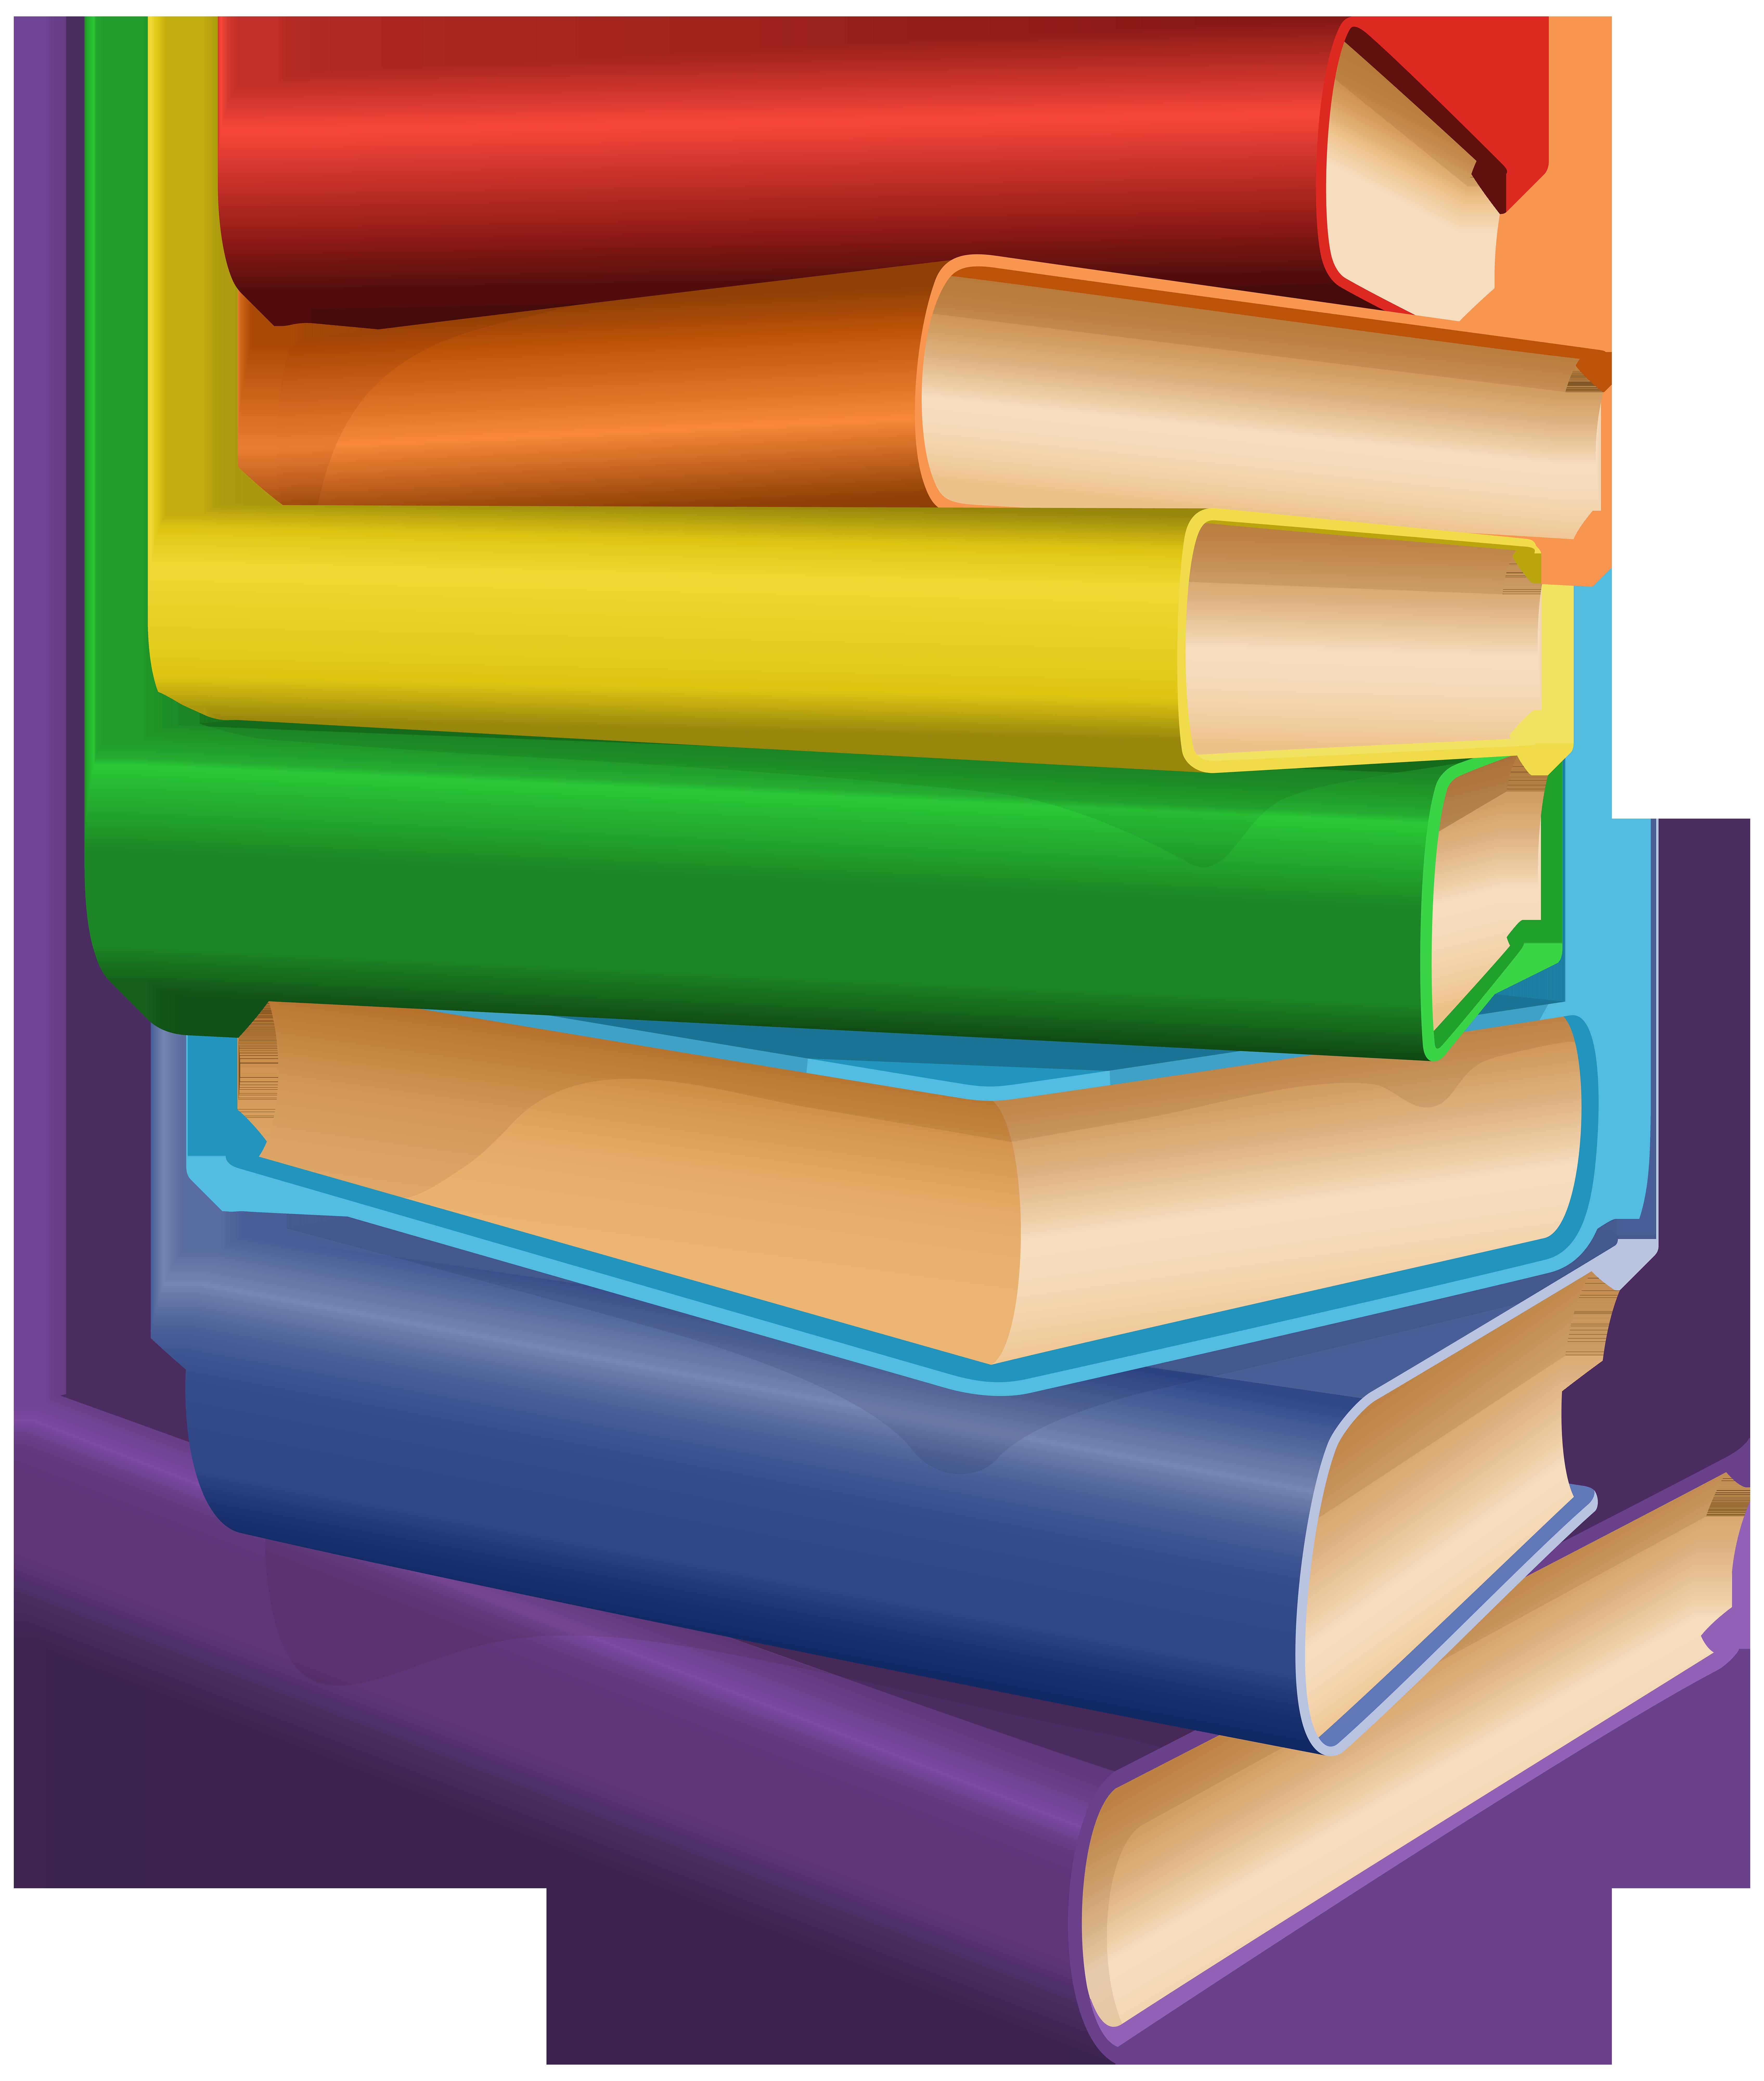 Books Clip Art PNG Image.